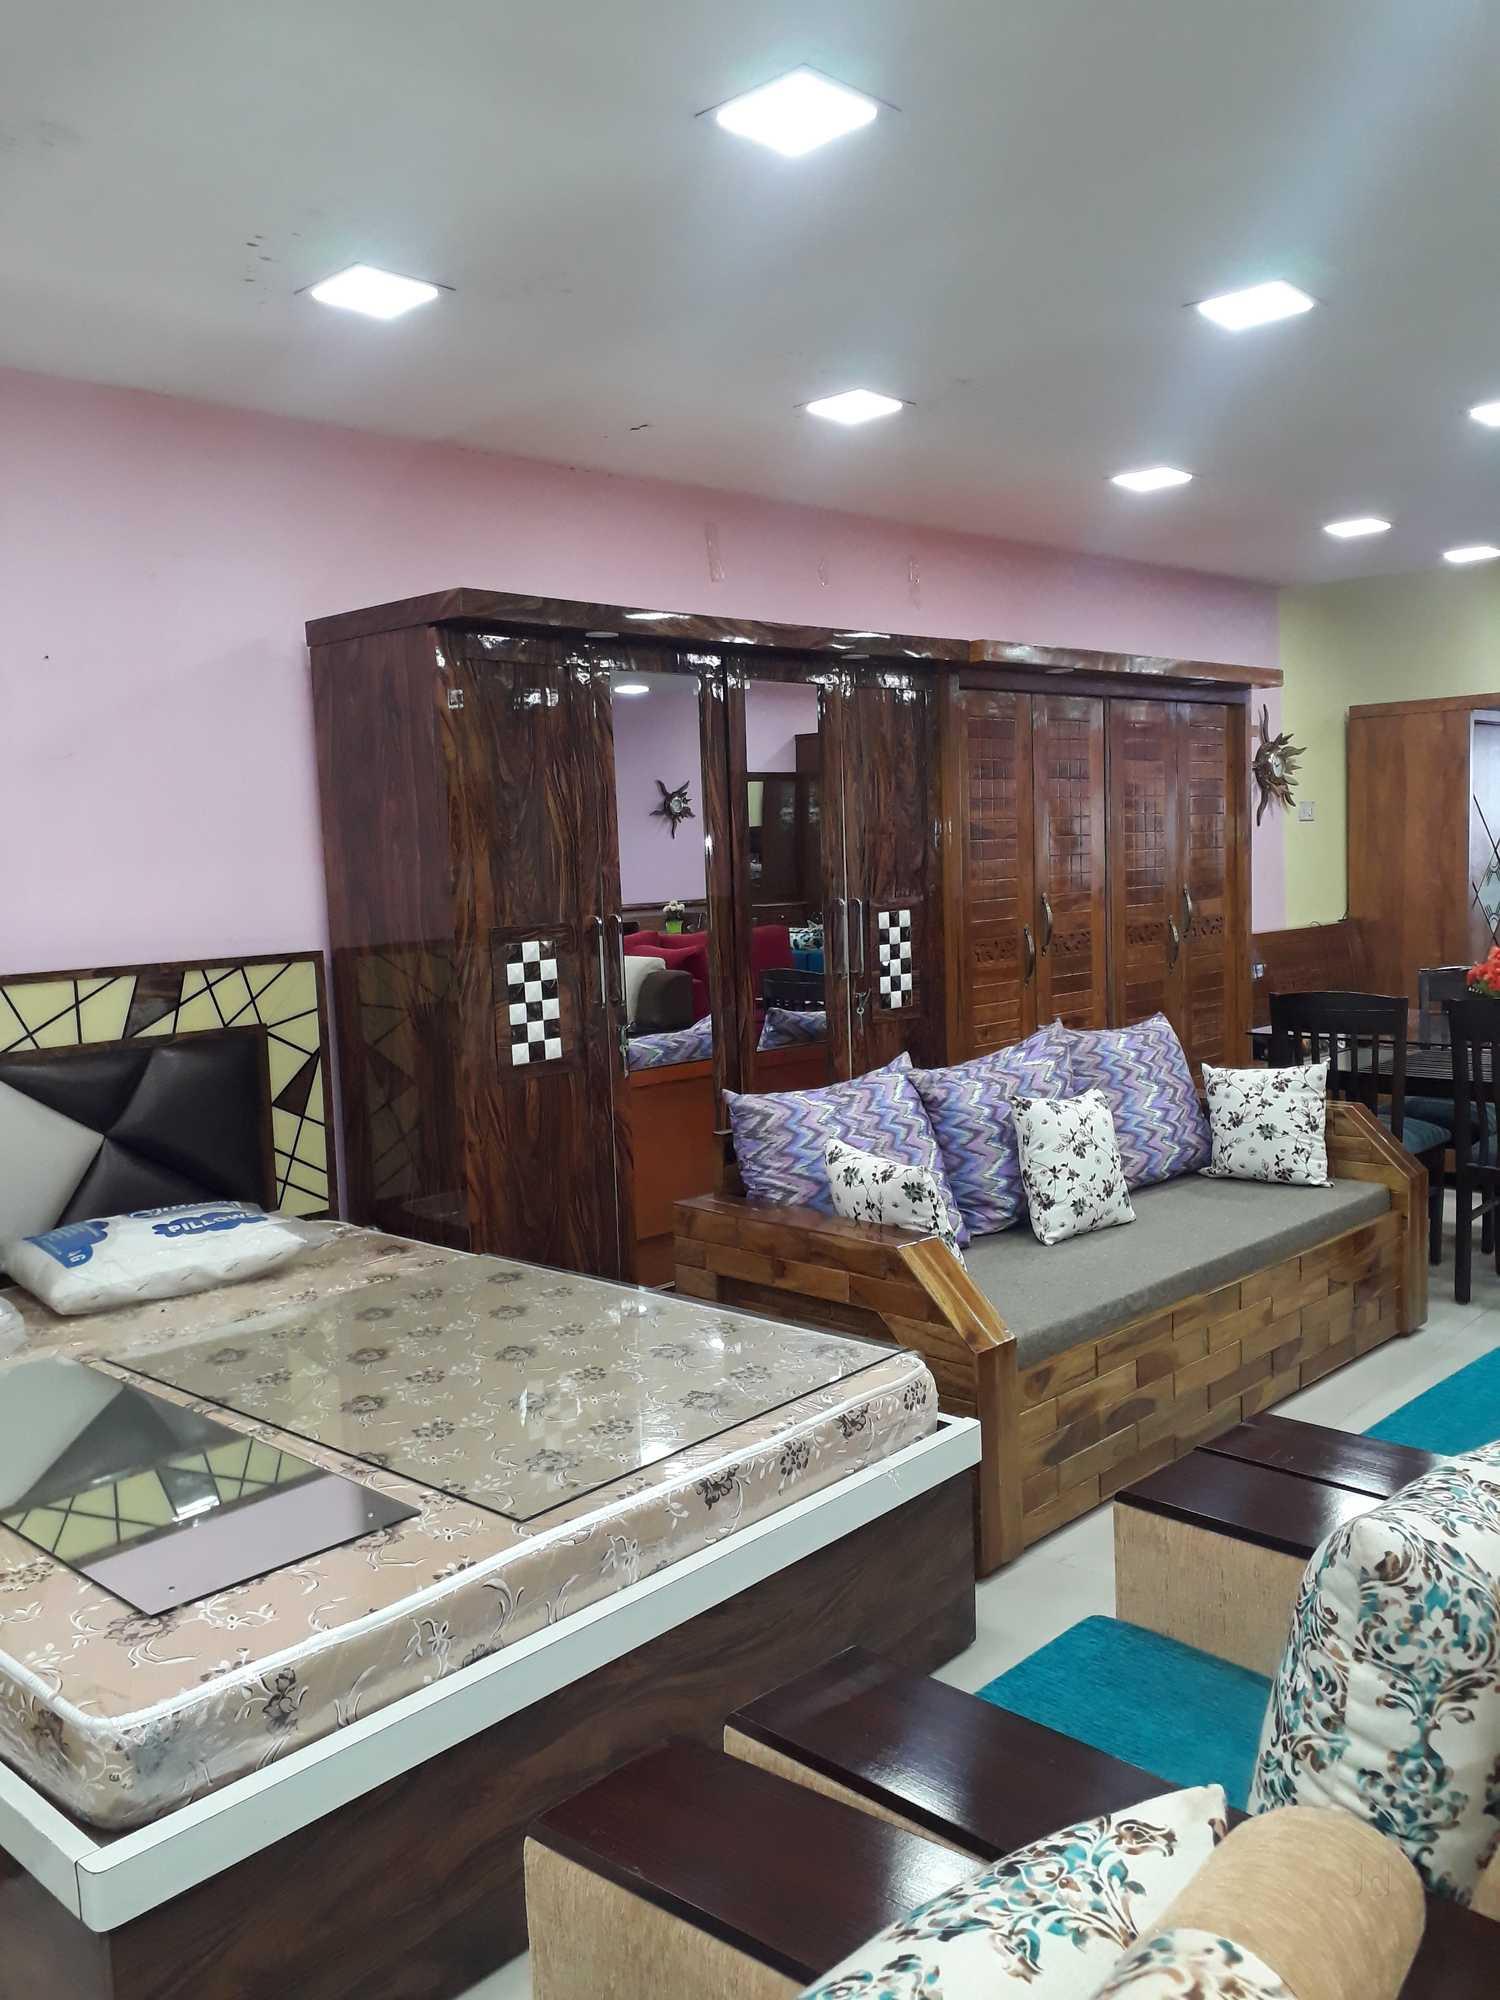 Kitchen Decor, Kharadi - Furniture Dealers in Pune - Justdial